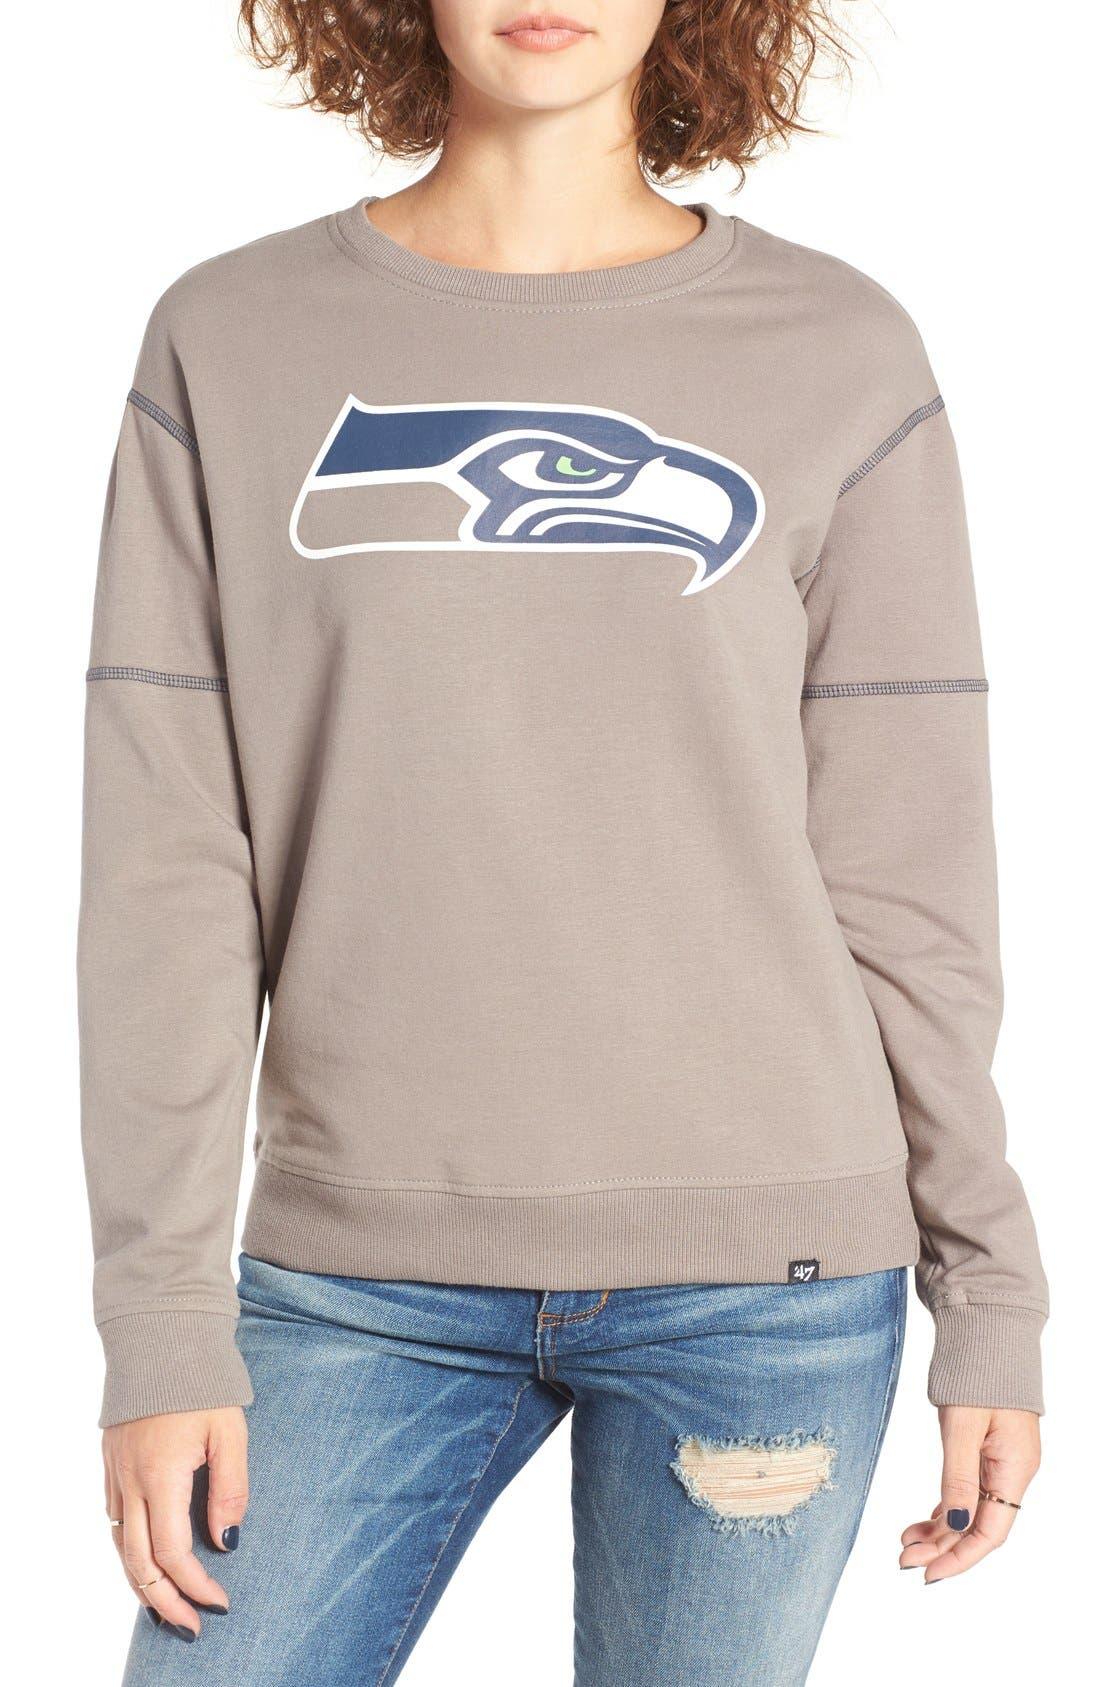 Alternate Image 1 Selected - '47 'Seattle Seahawks' Graphic Sweatshirt